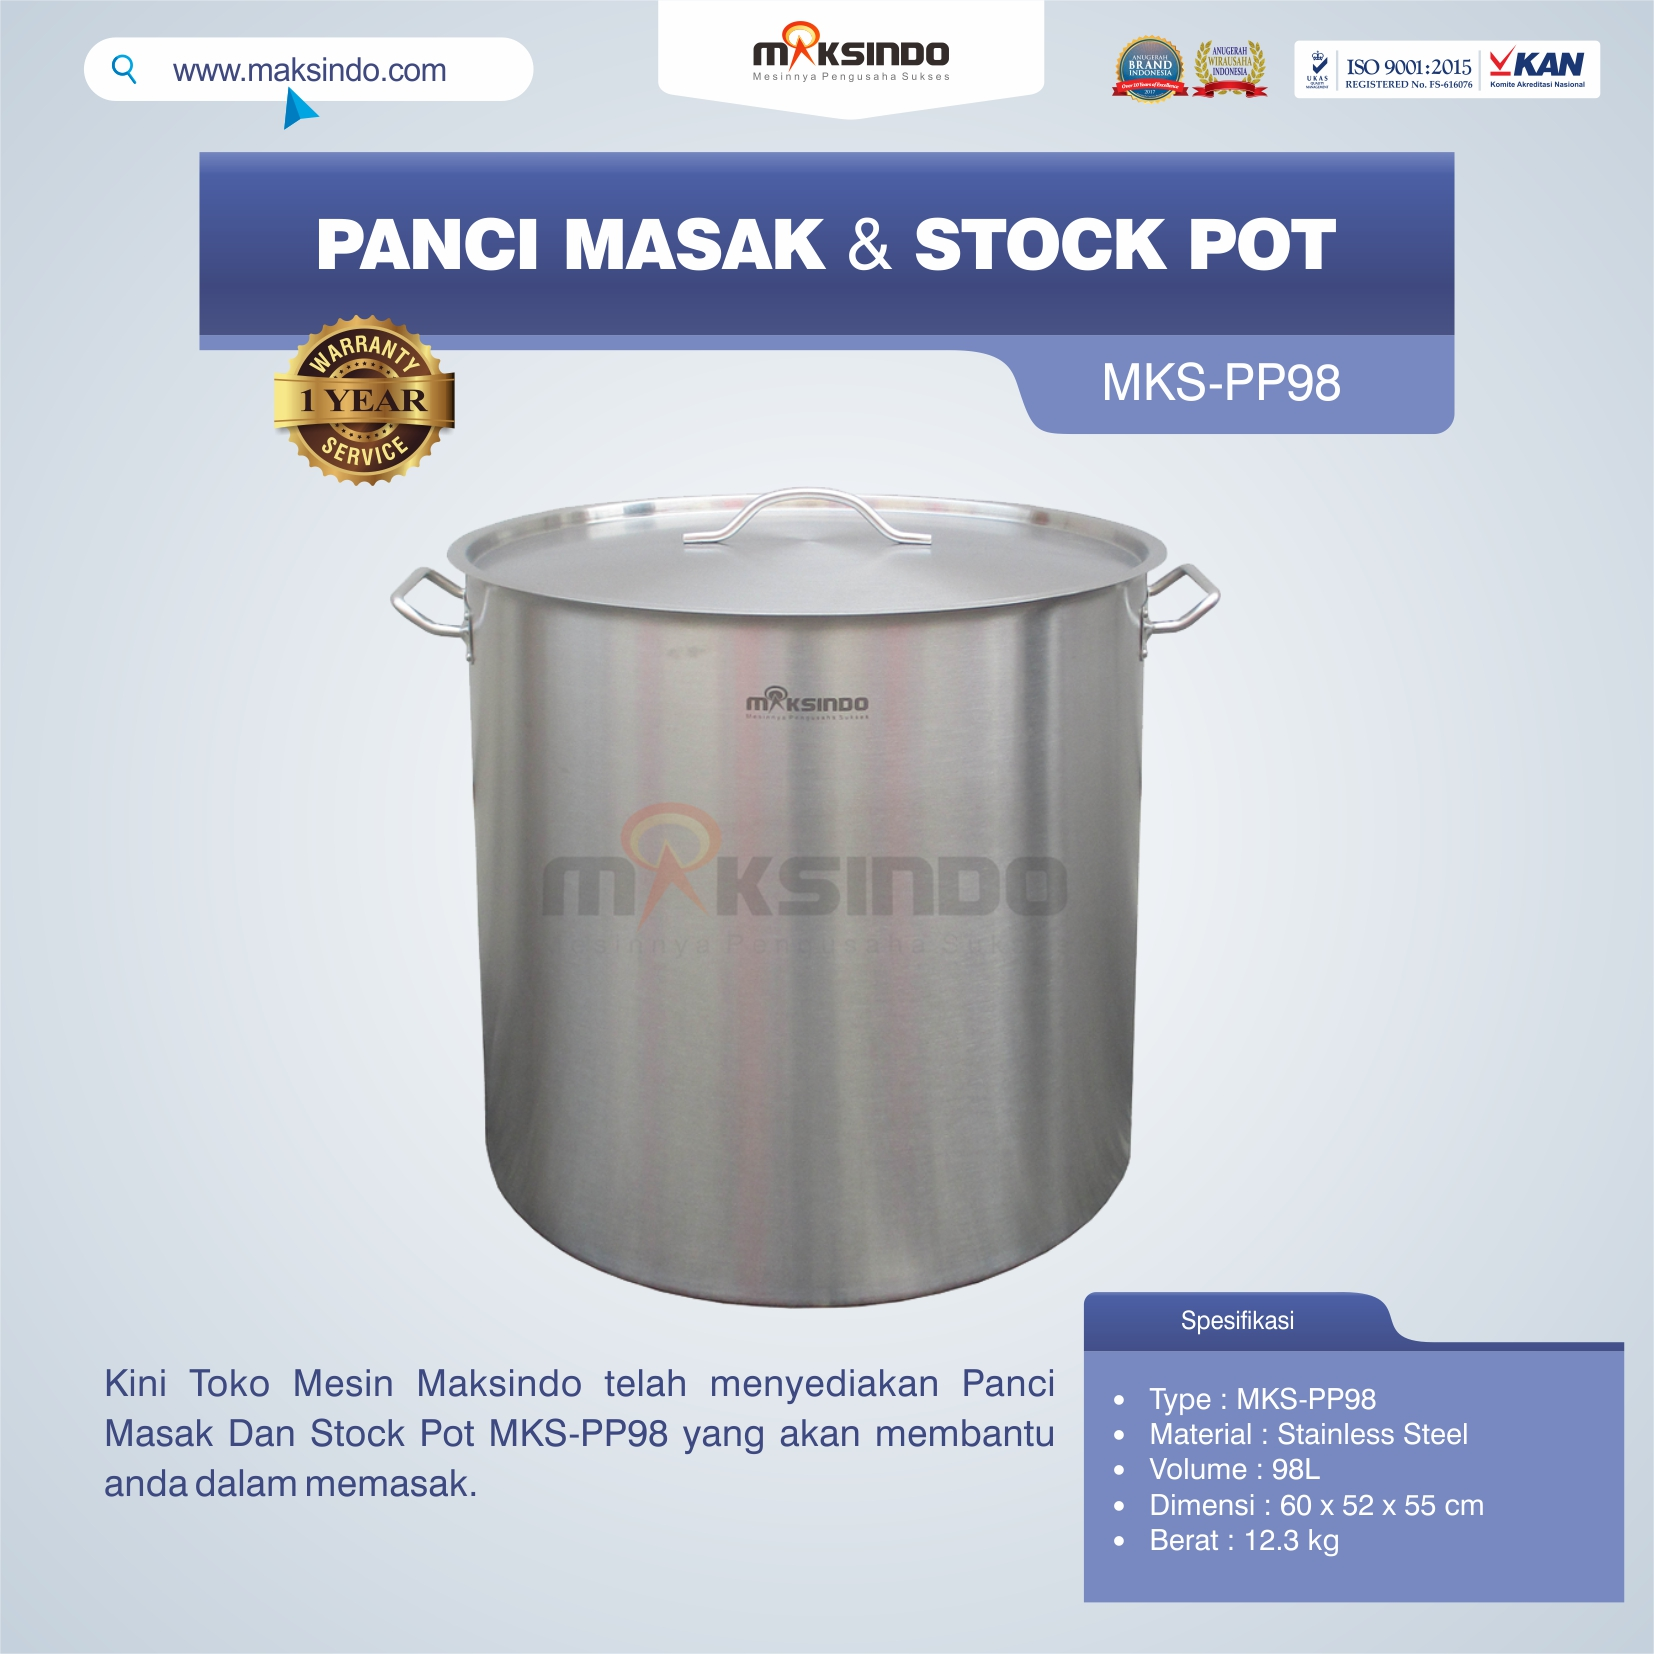 MKS-PP98 Panci Masak Dan Stock Pot